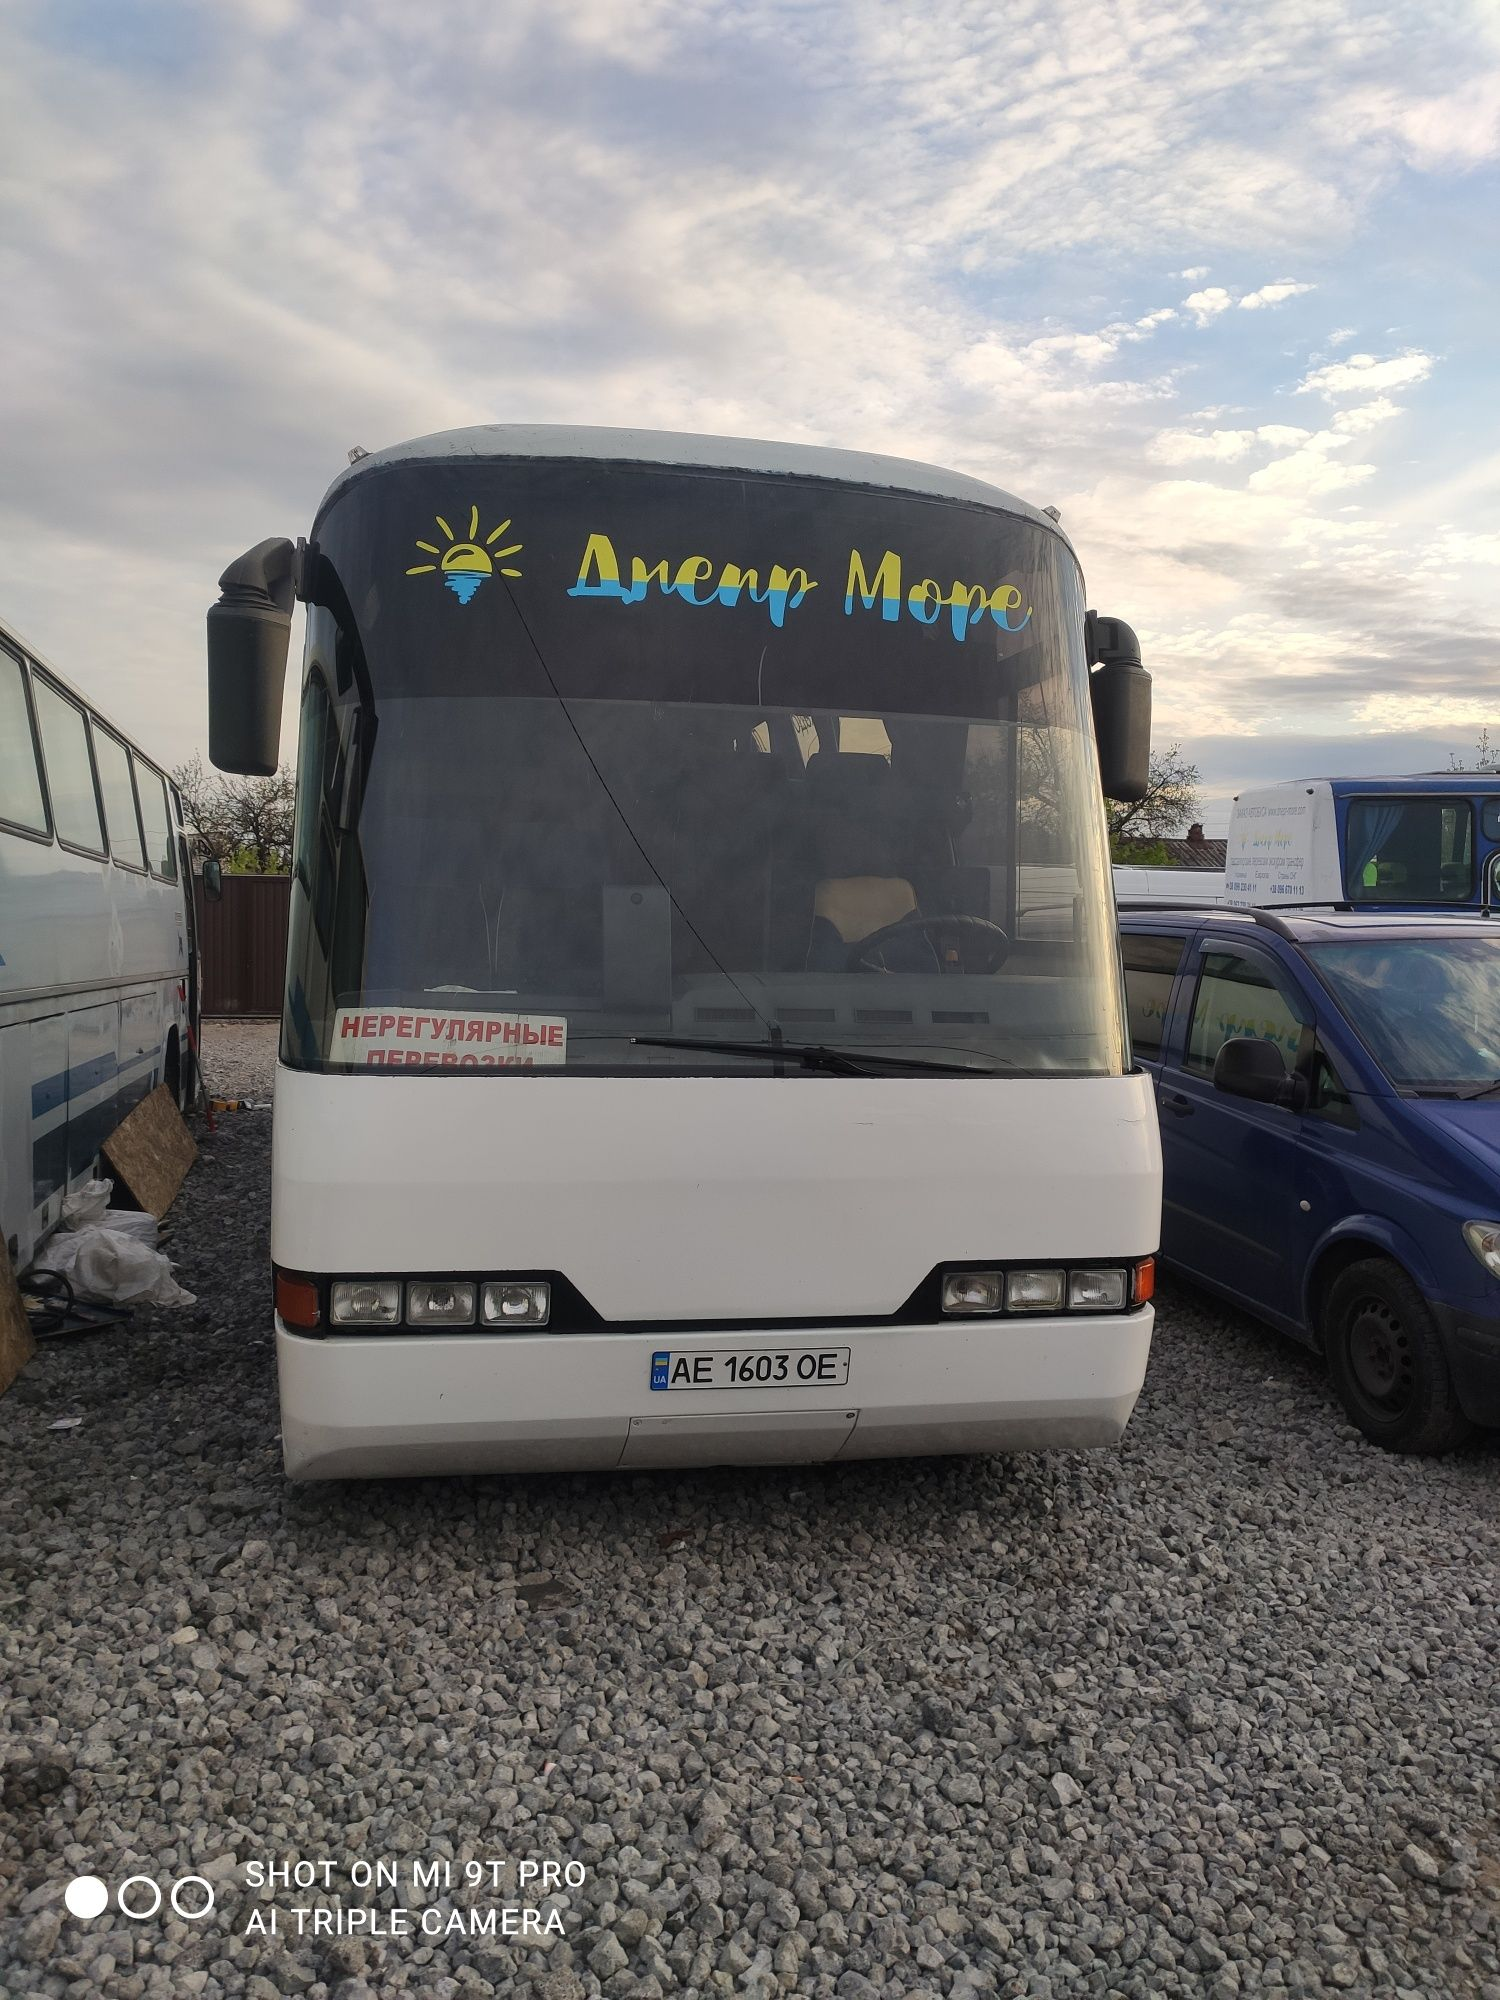 Аренда автобуса Neoplan 216 на 52 посадочных мест